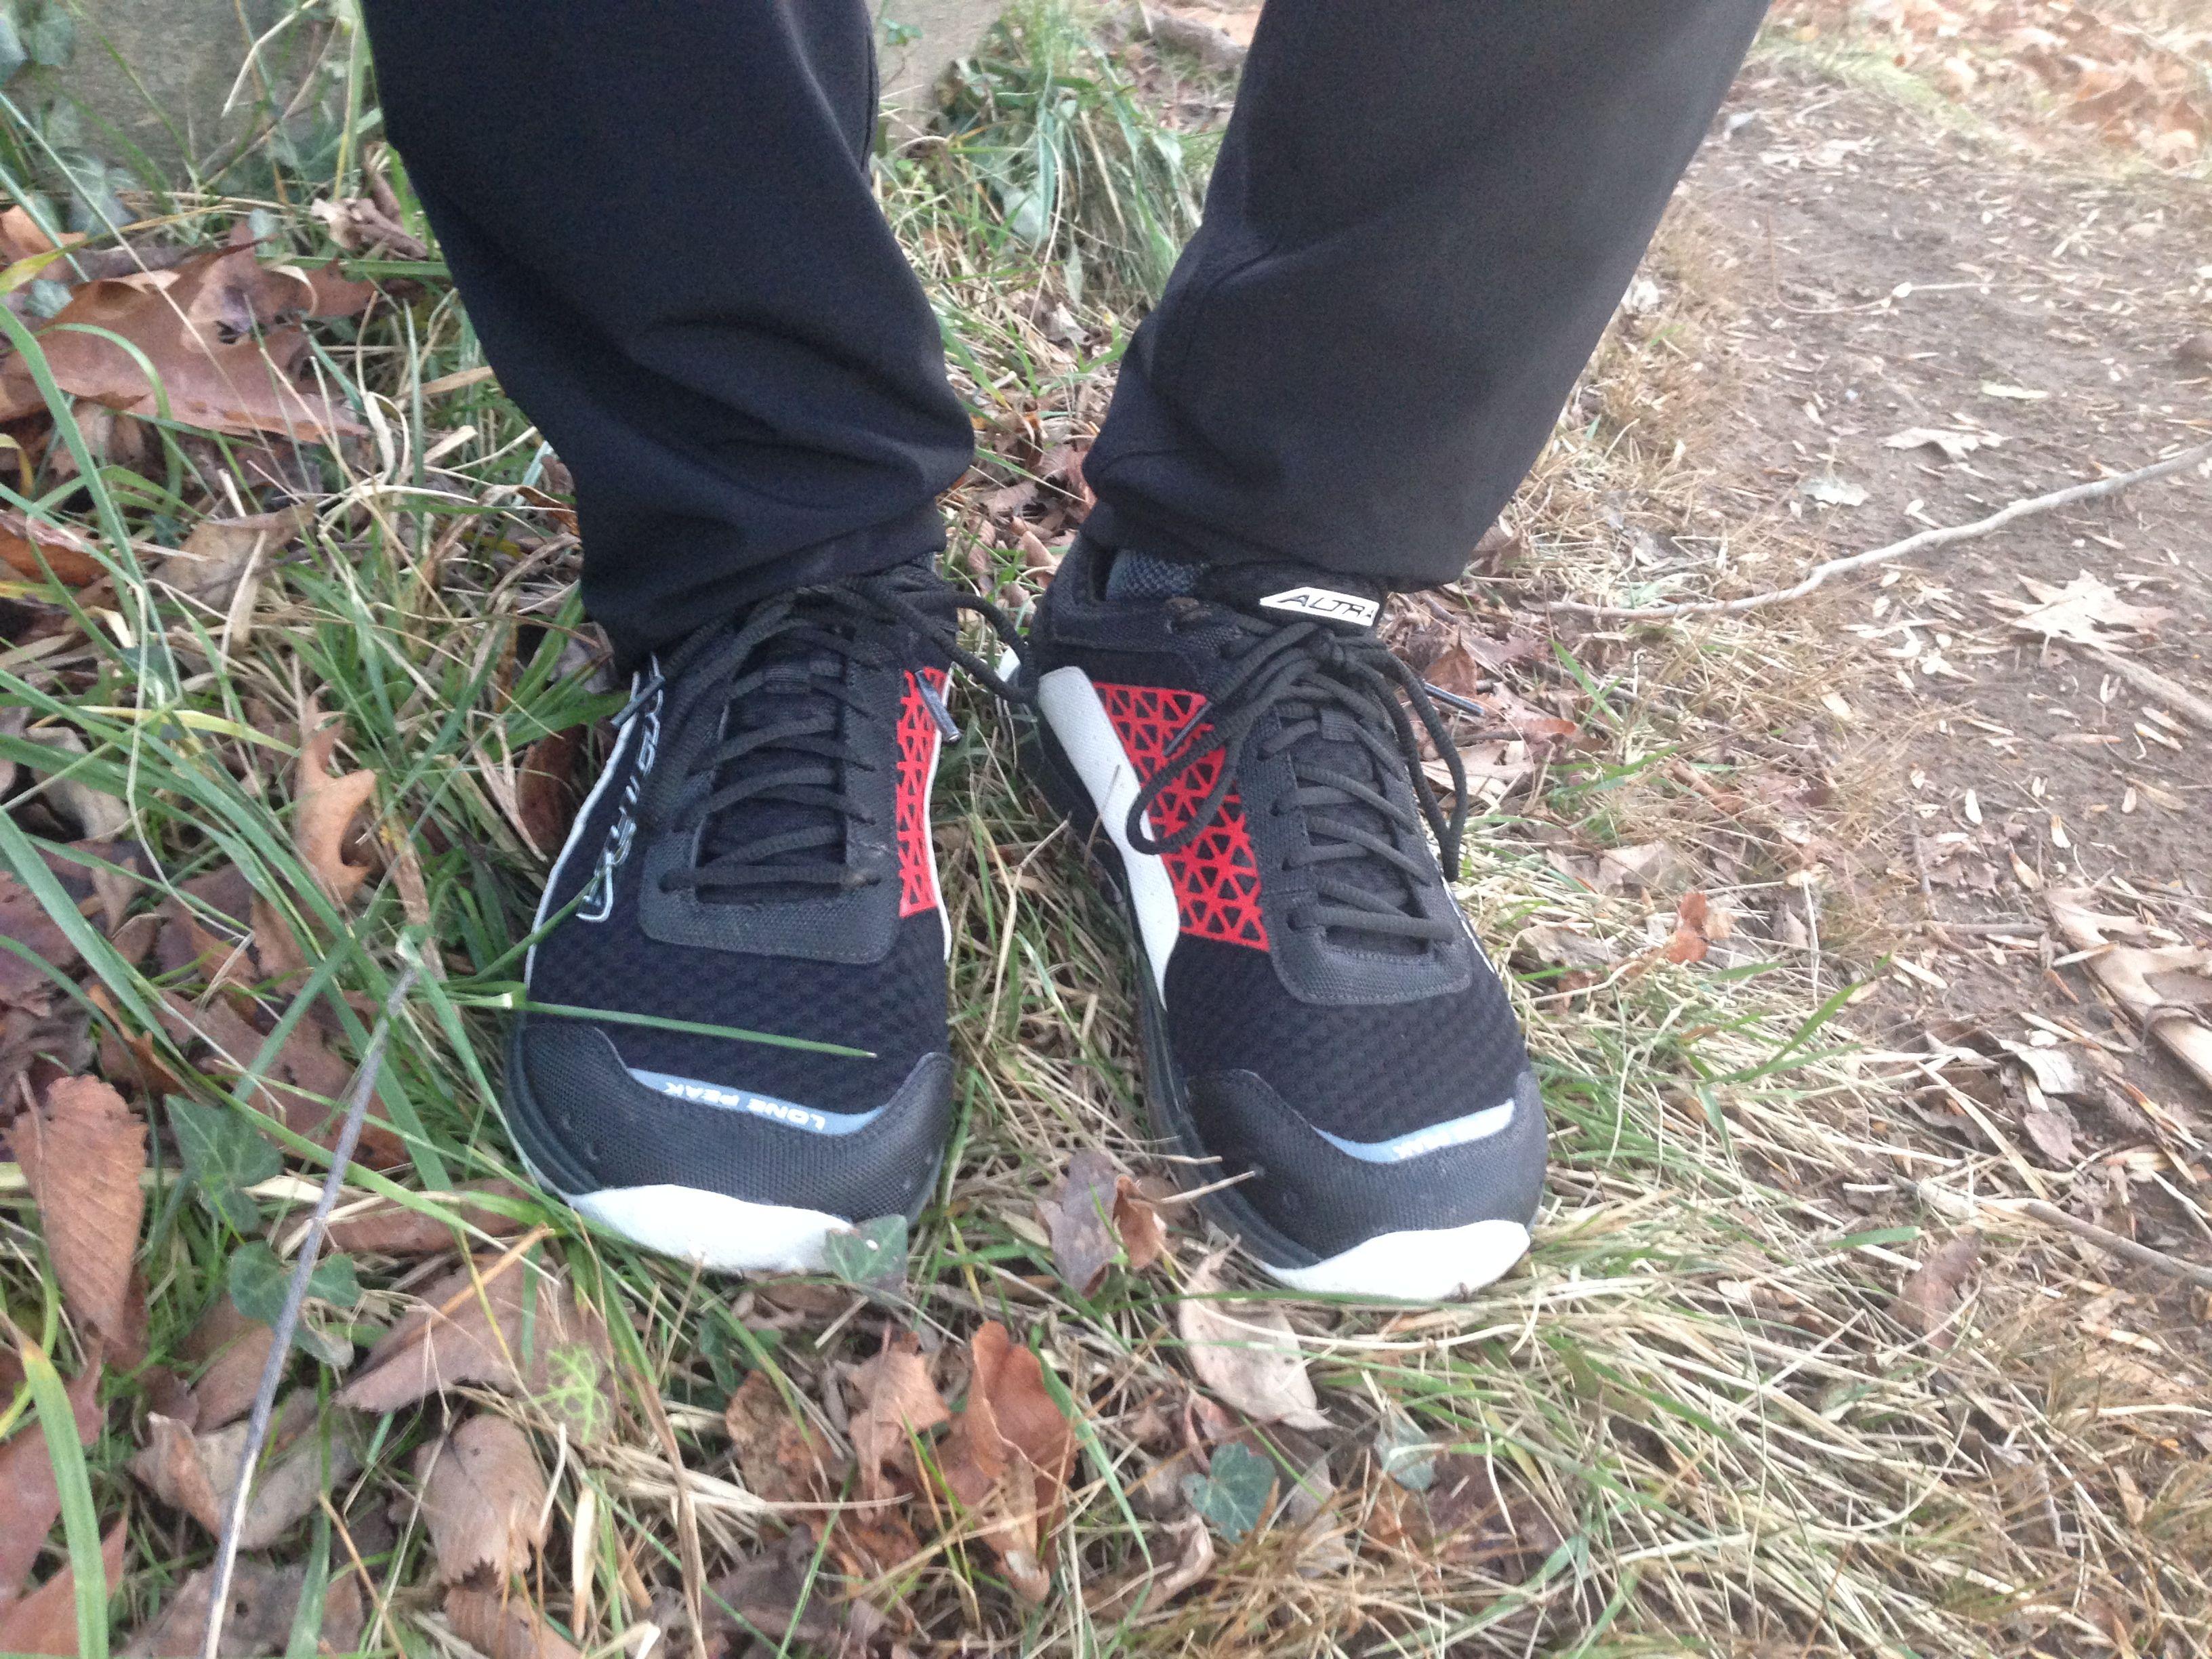 Merrell's Trail Glove Mens Minimalist Trail Running Shoe Review